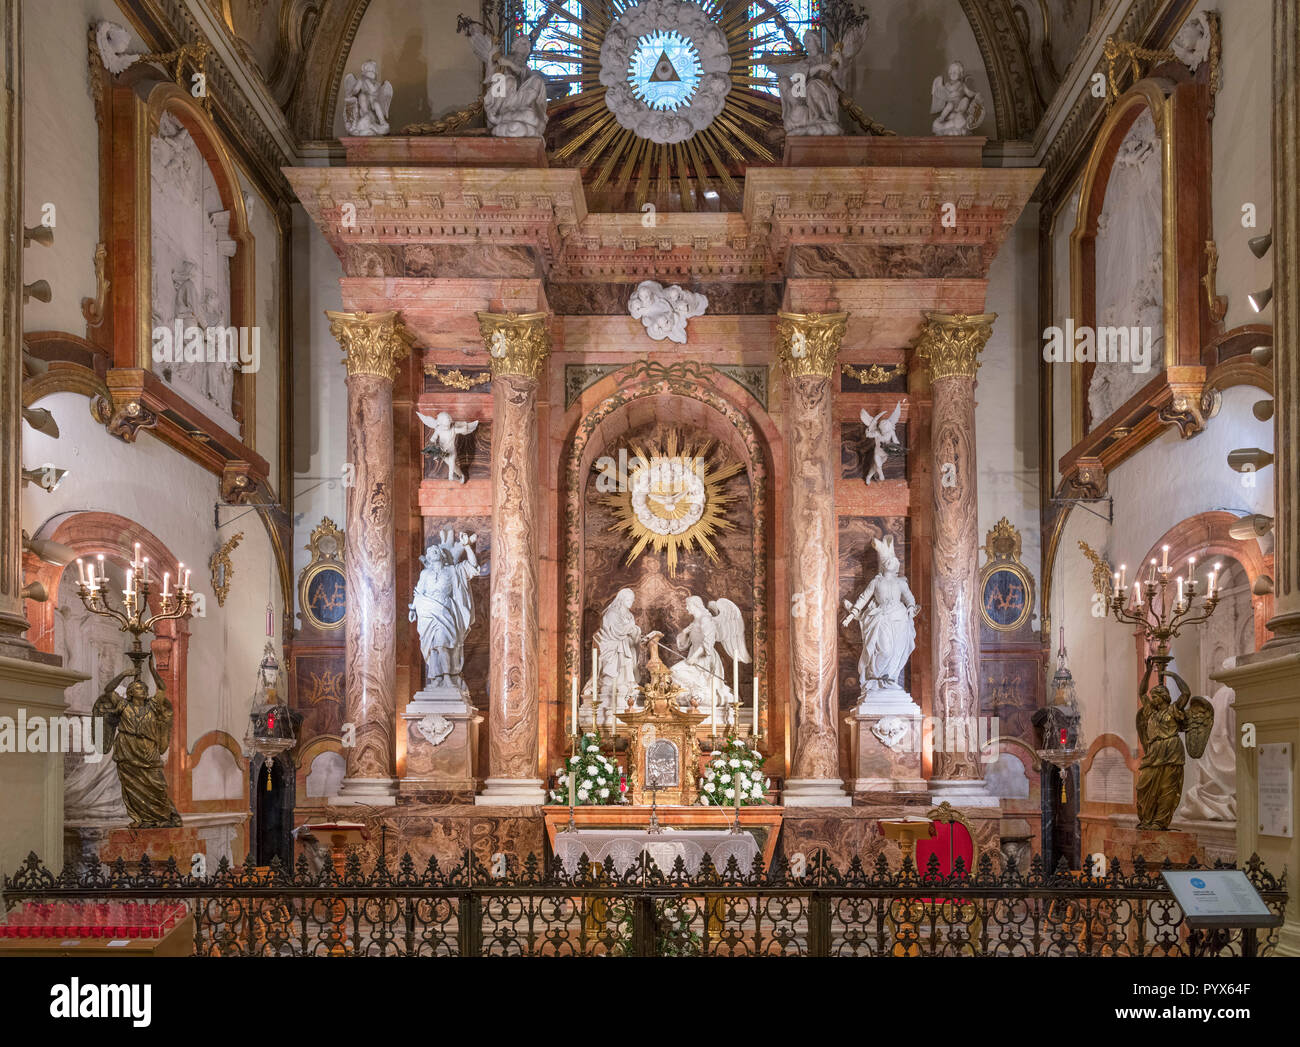 Capella de la Encarnacion (chapelle de l'Incarnation), la cathédrale de Málaga, Málaga, Costa del Sol, Andalousie, Espagne Banque D'Images